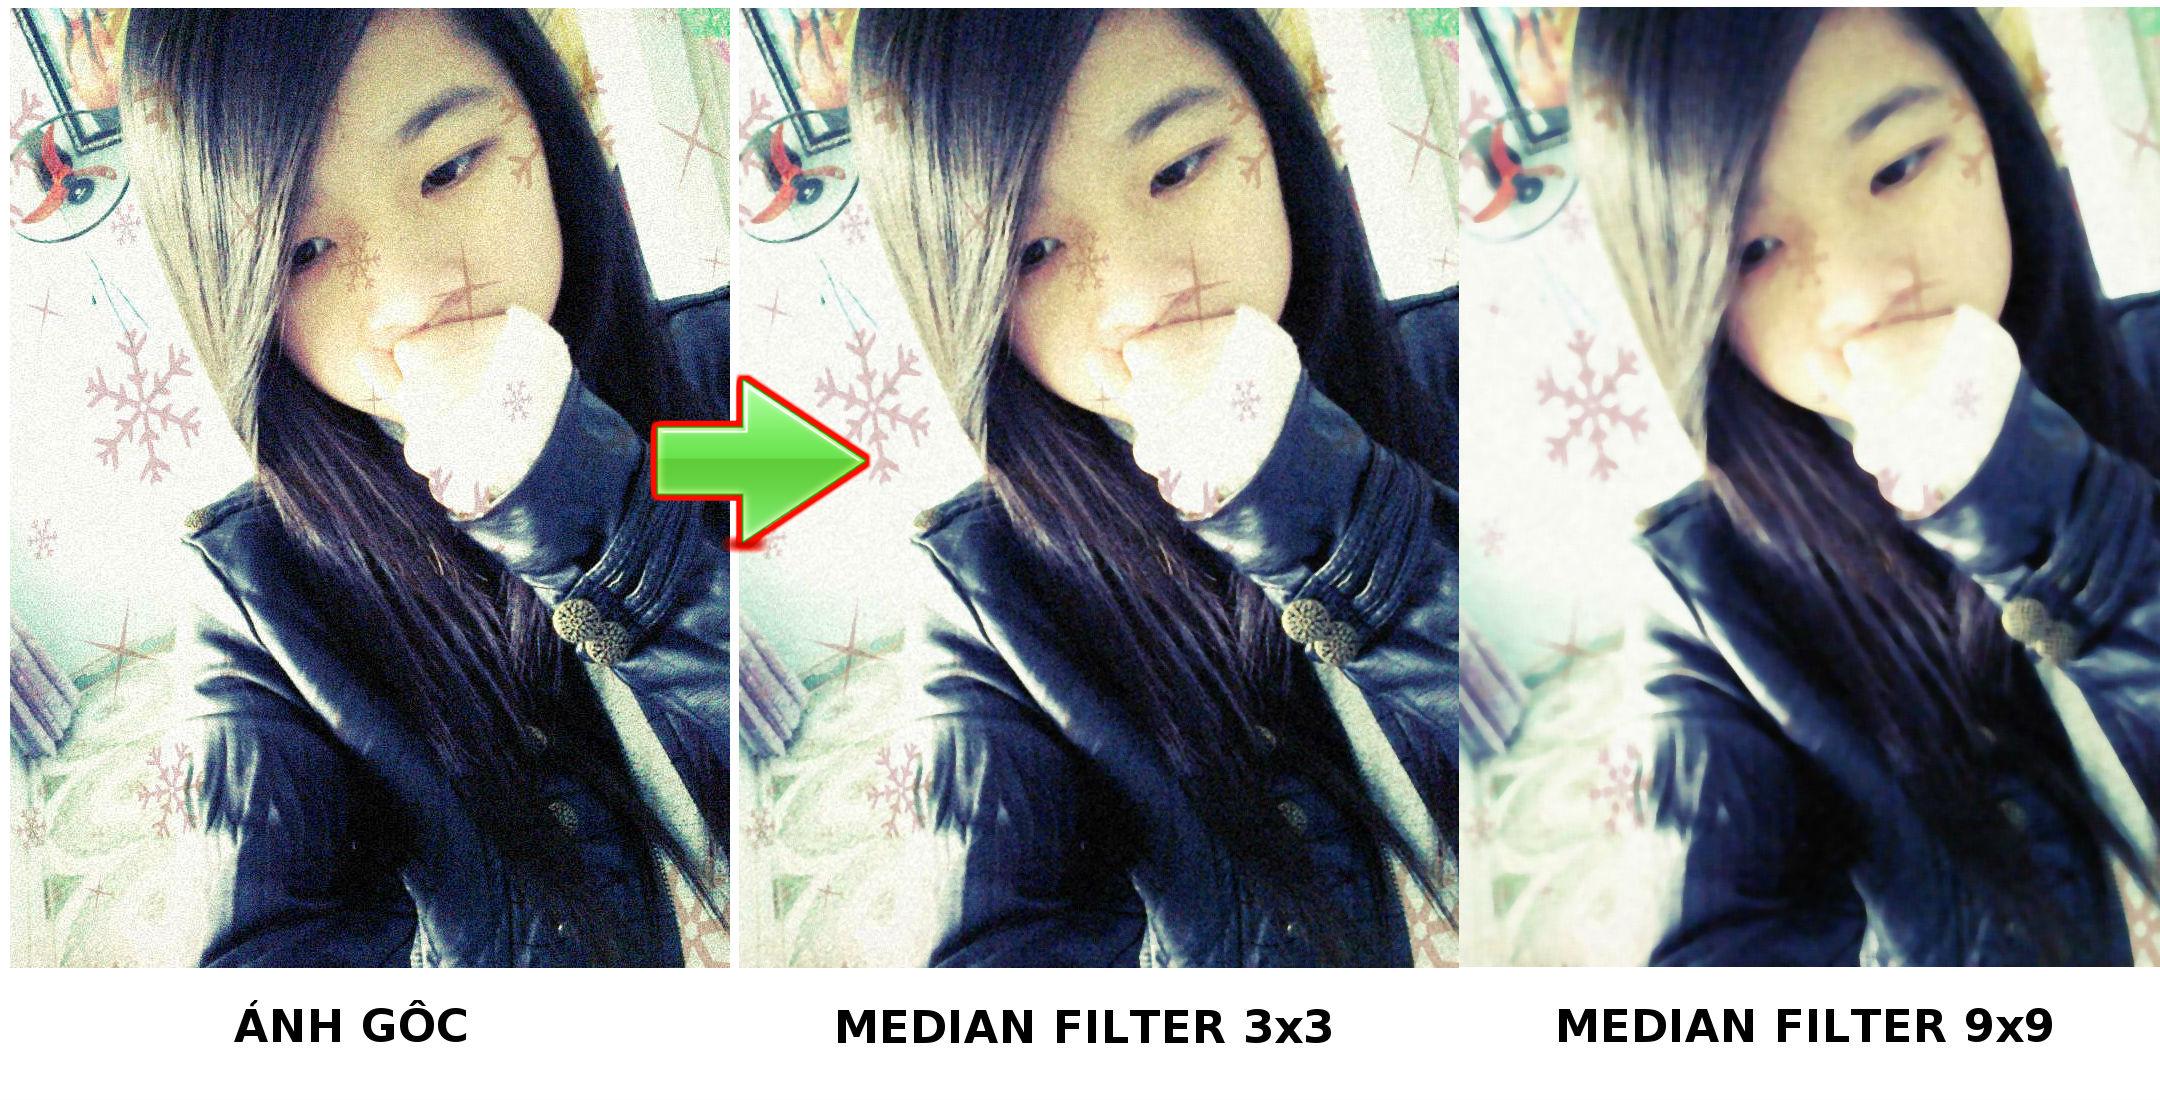 median blur